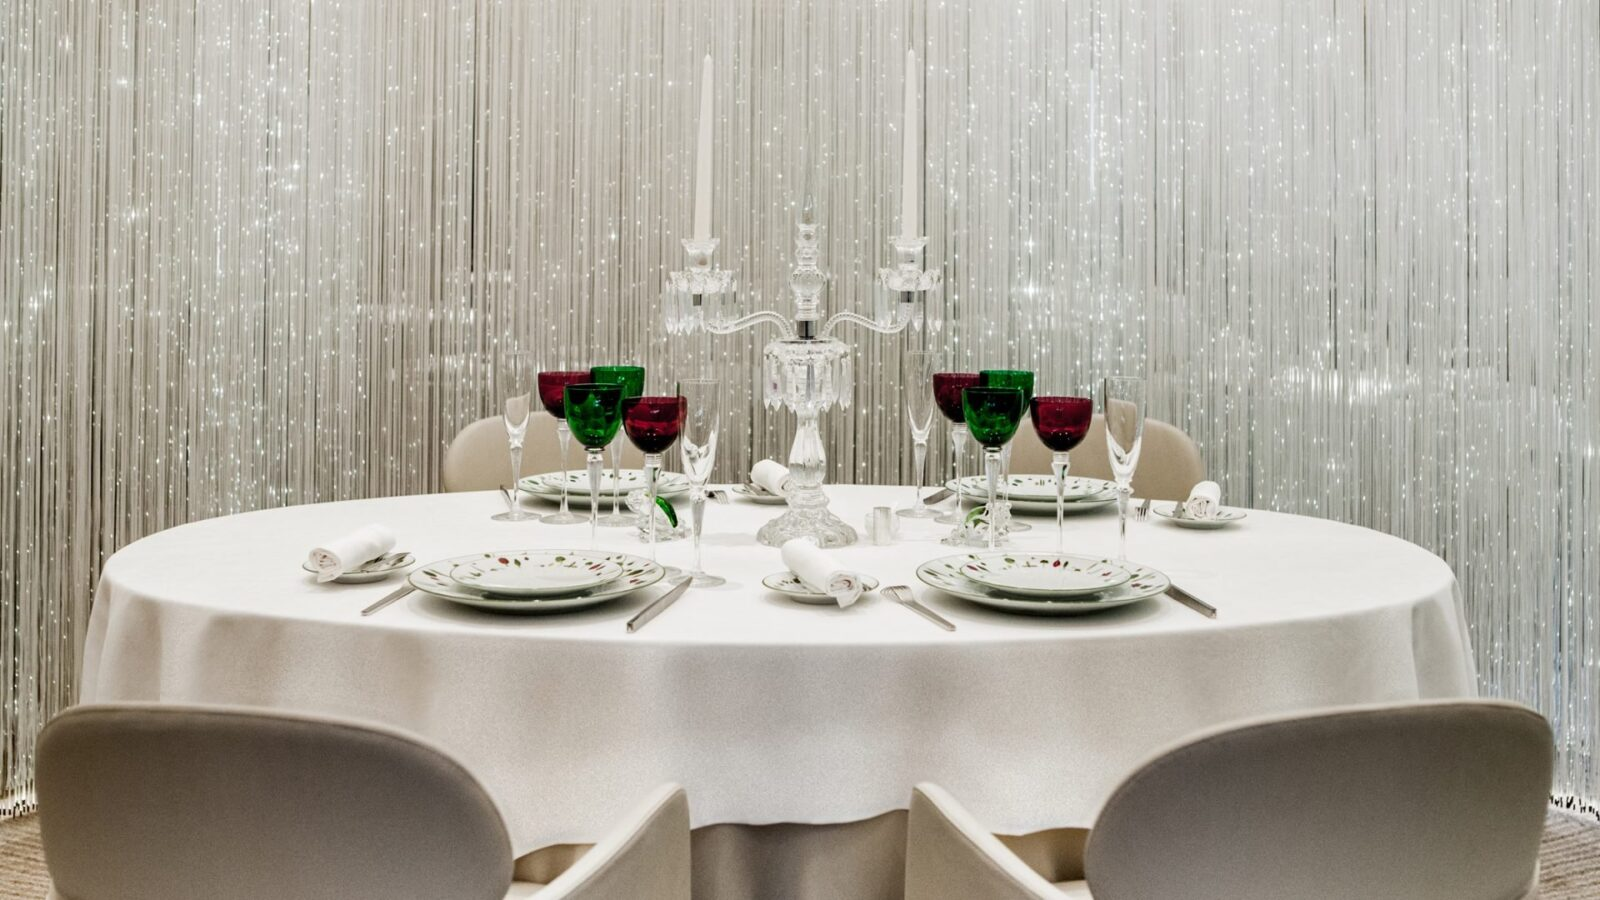 Alan ducasse restaurants the dorchester dorchester for Cafe le jardin bell lane london